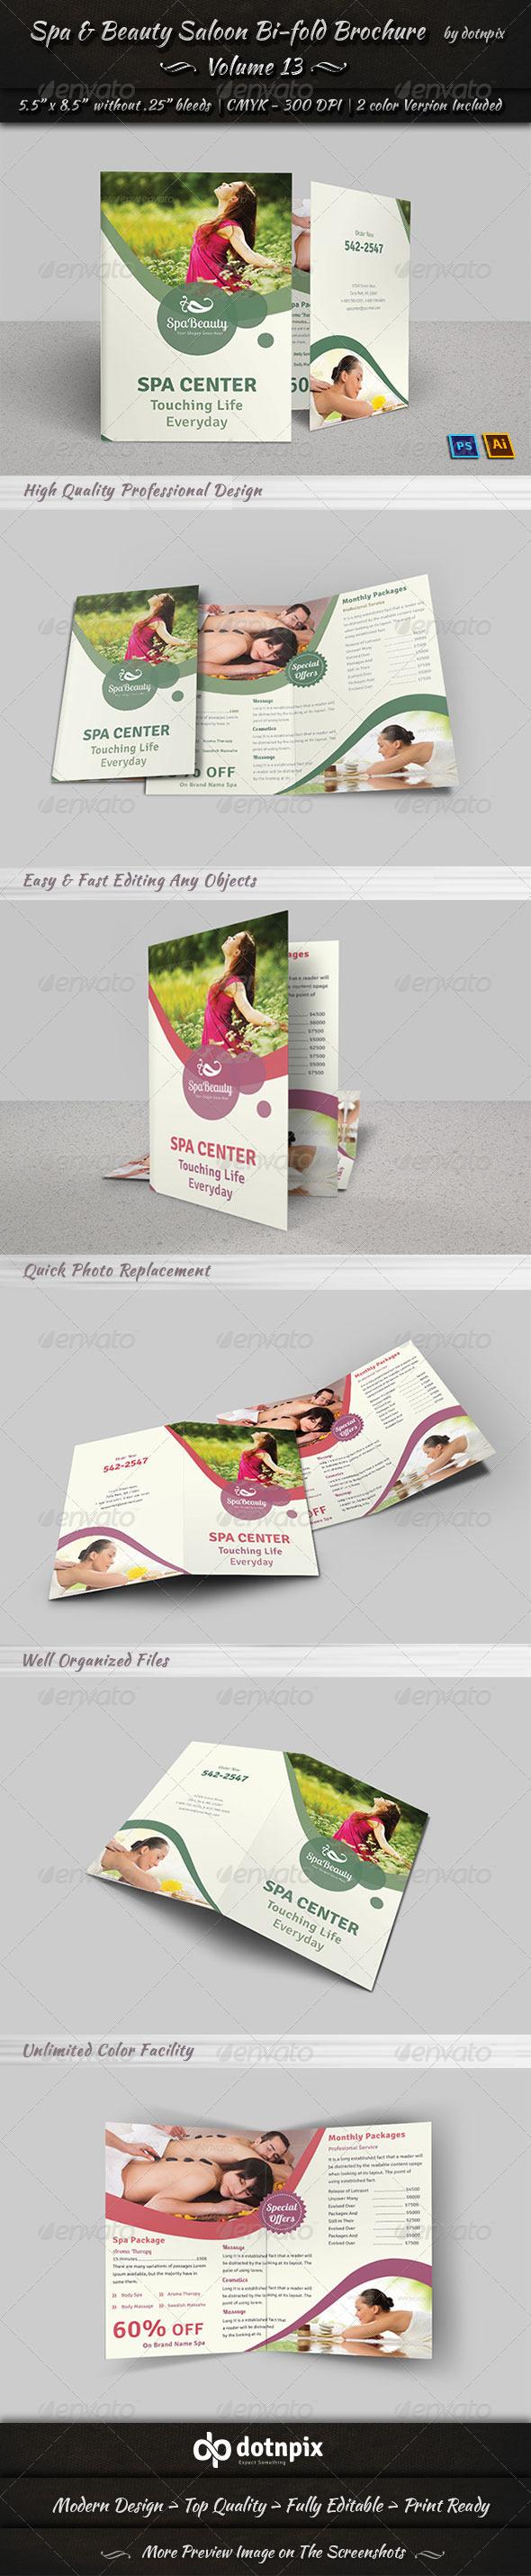 GraphicRiver Spa & Beauty Saloon Bi-fold Brochure Volume 13 7990956